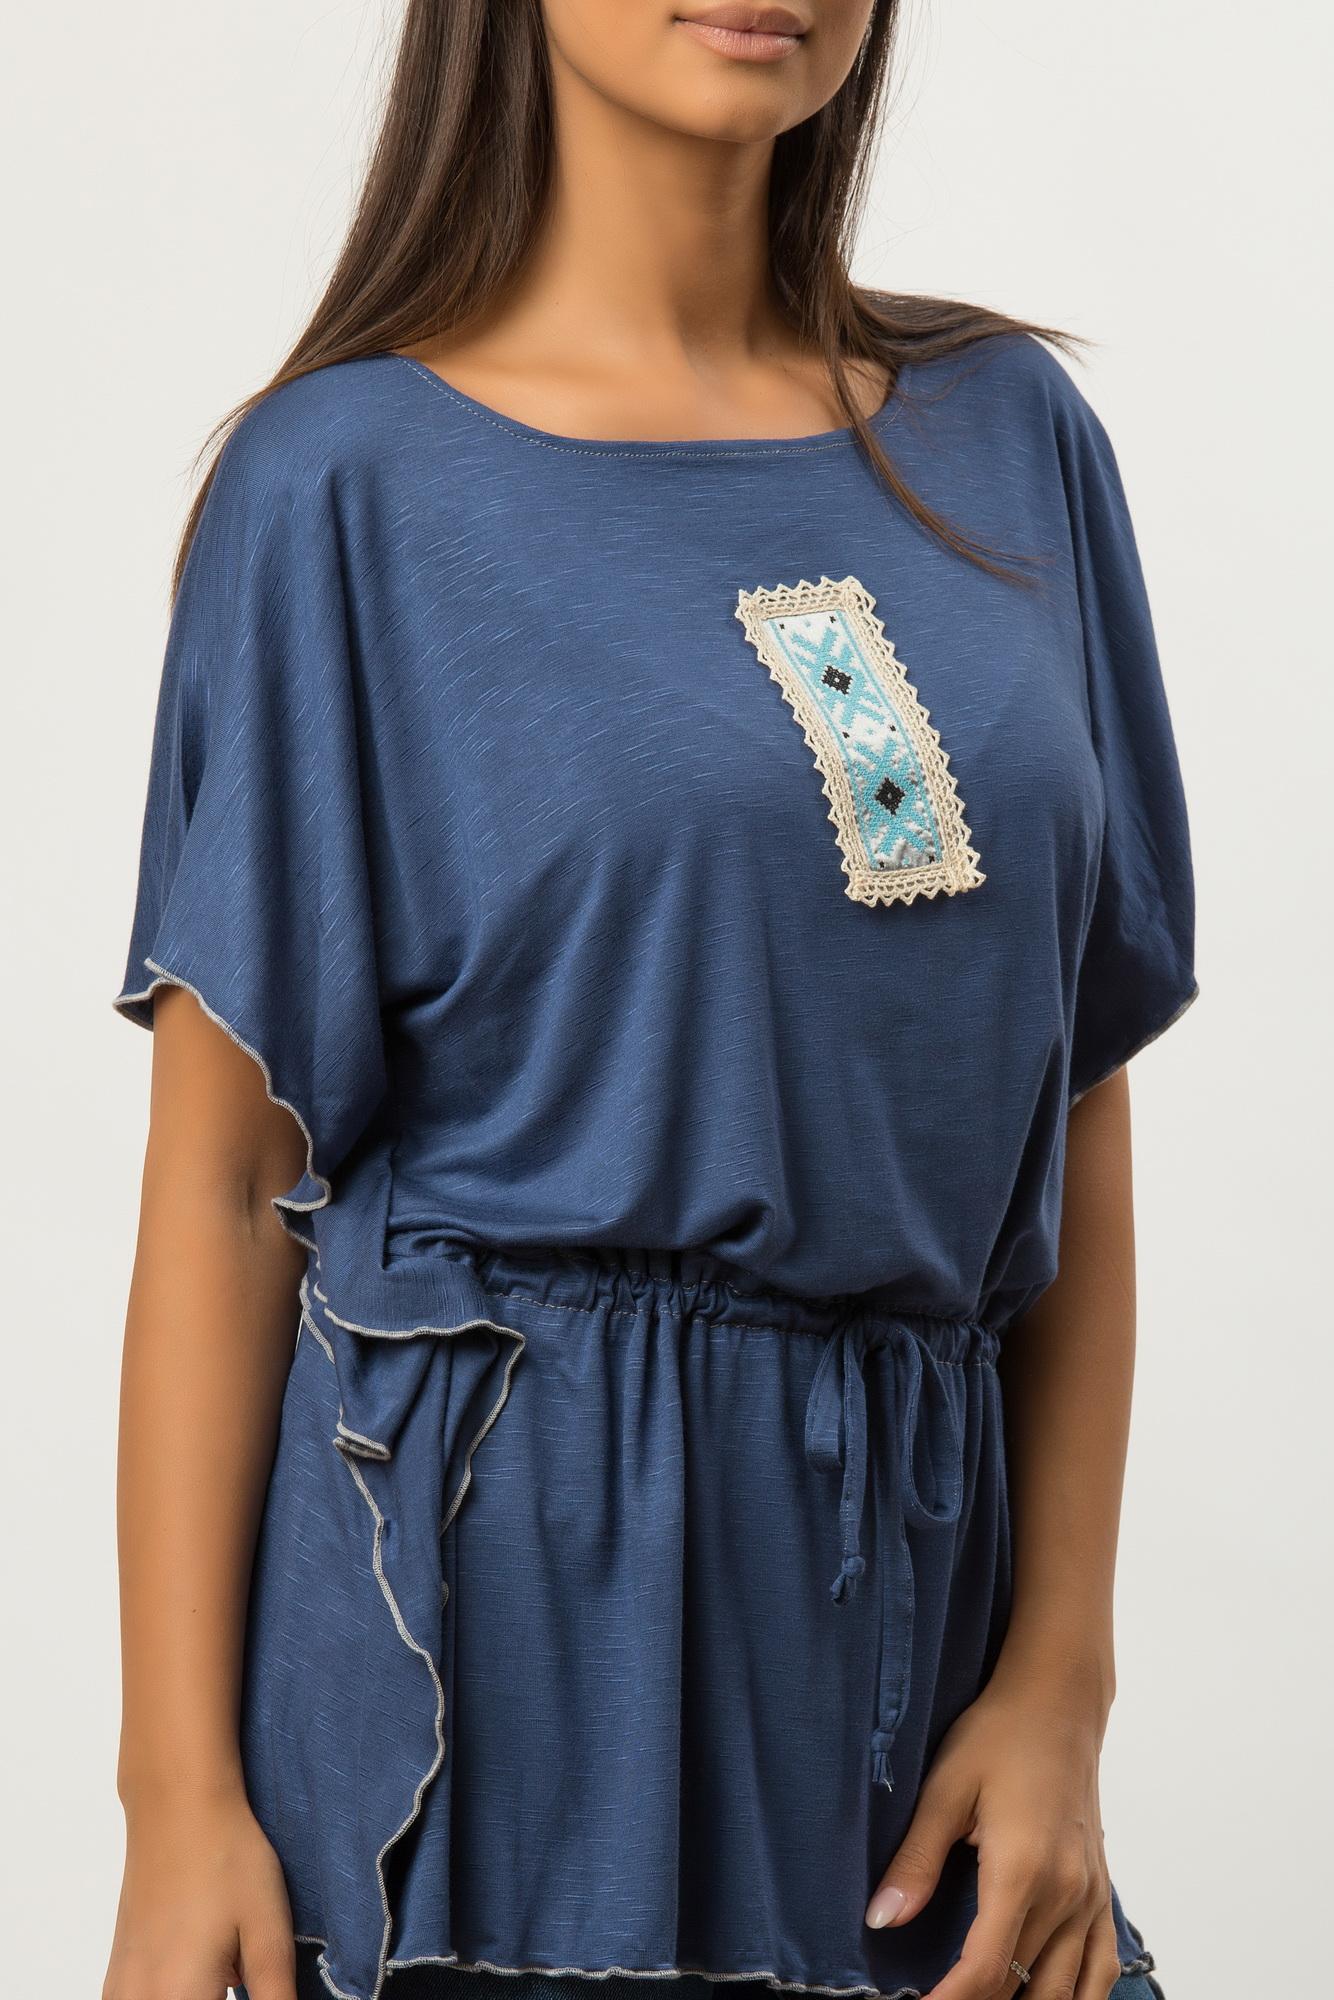 Bluza albastru denim larga cu aplicatie etno brodata CBM1260